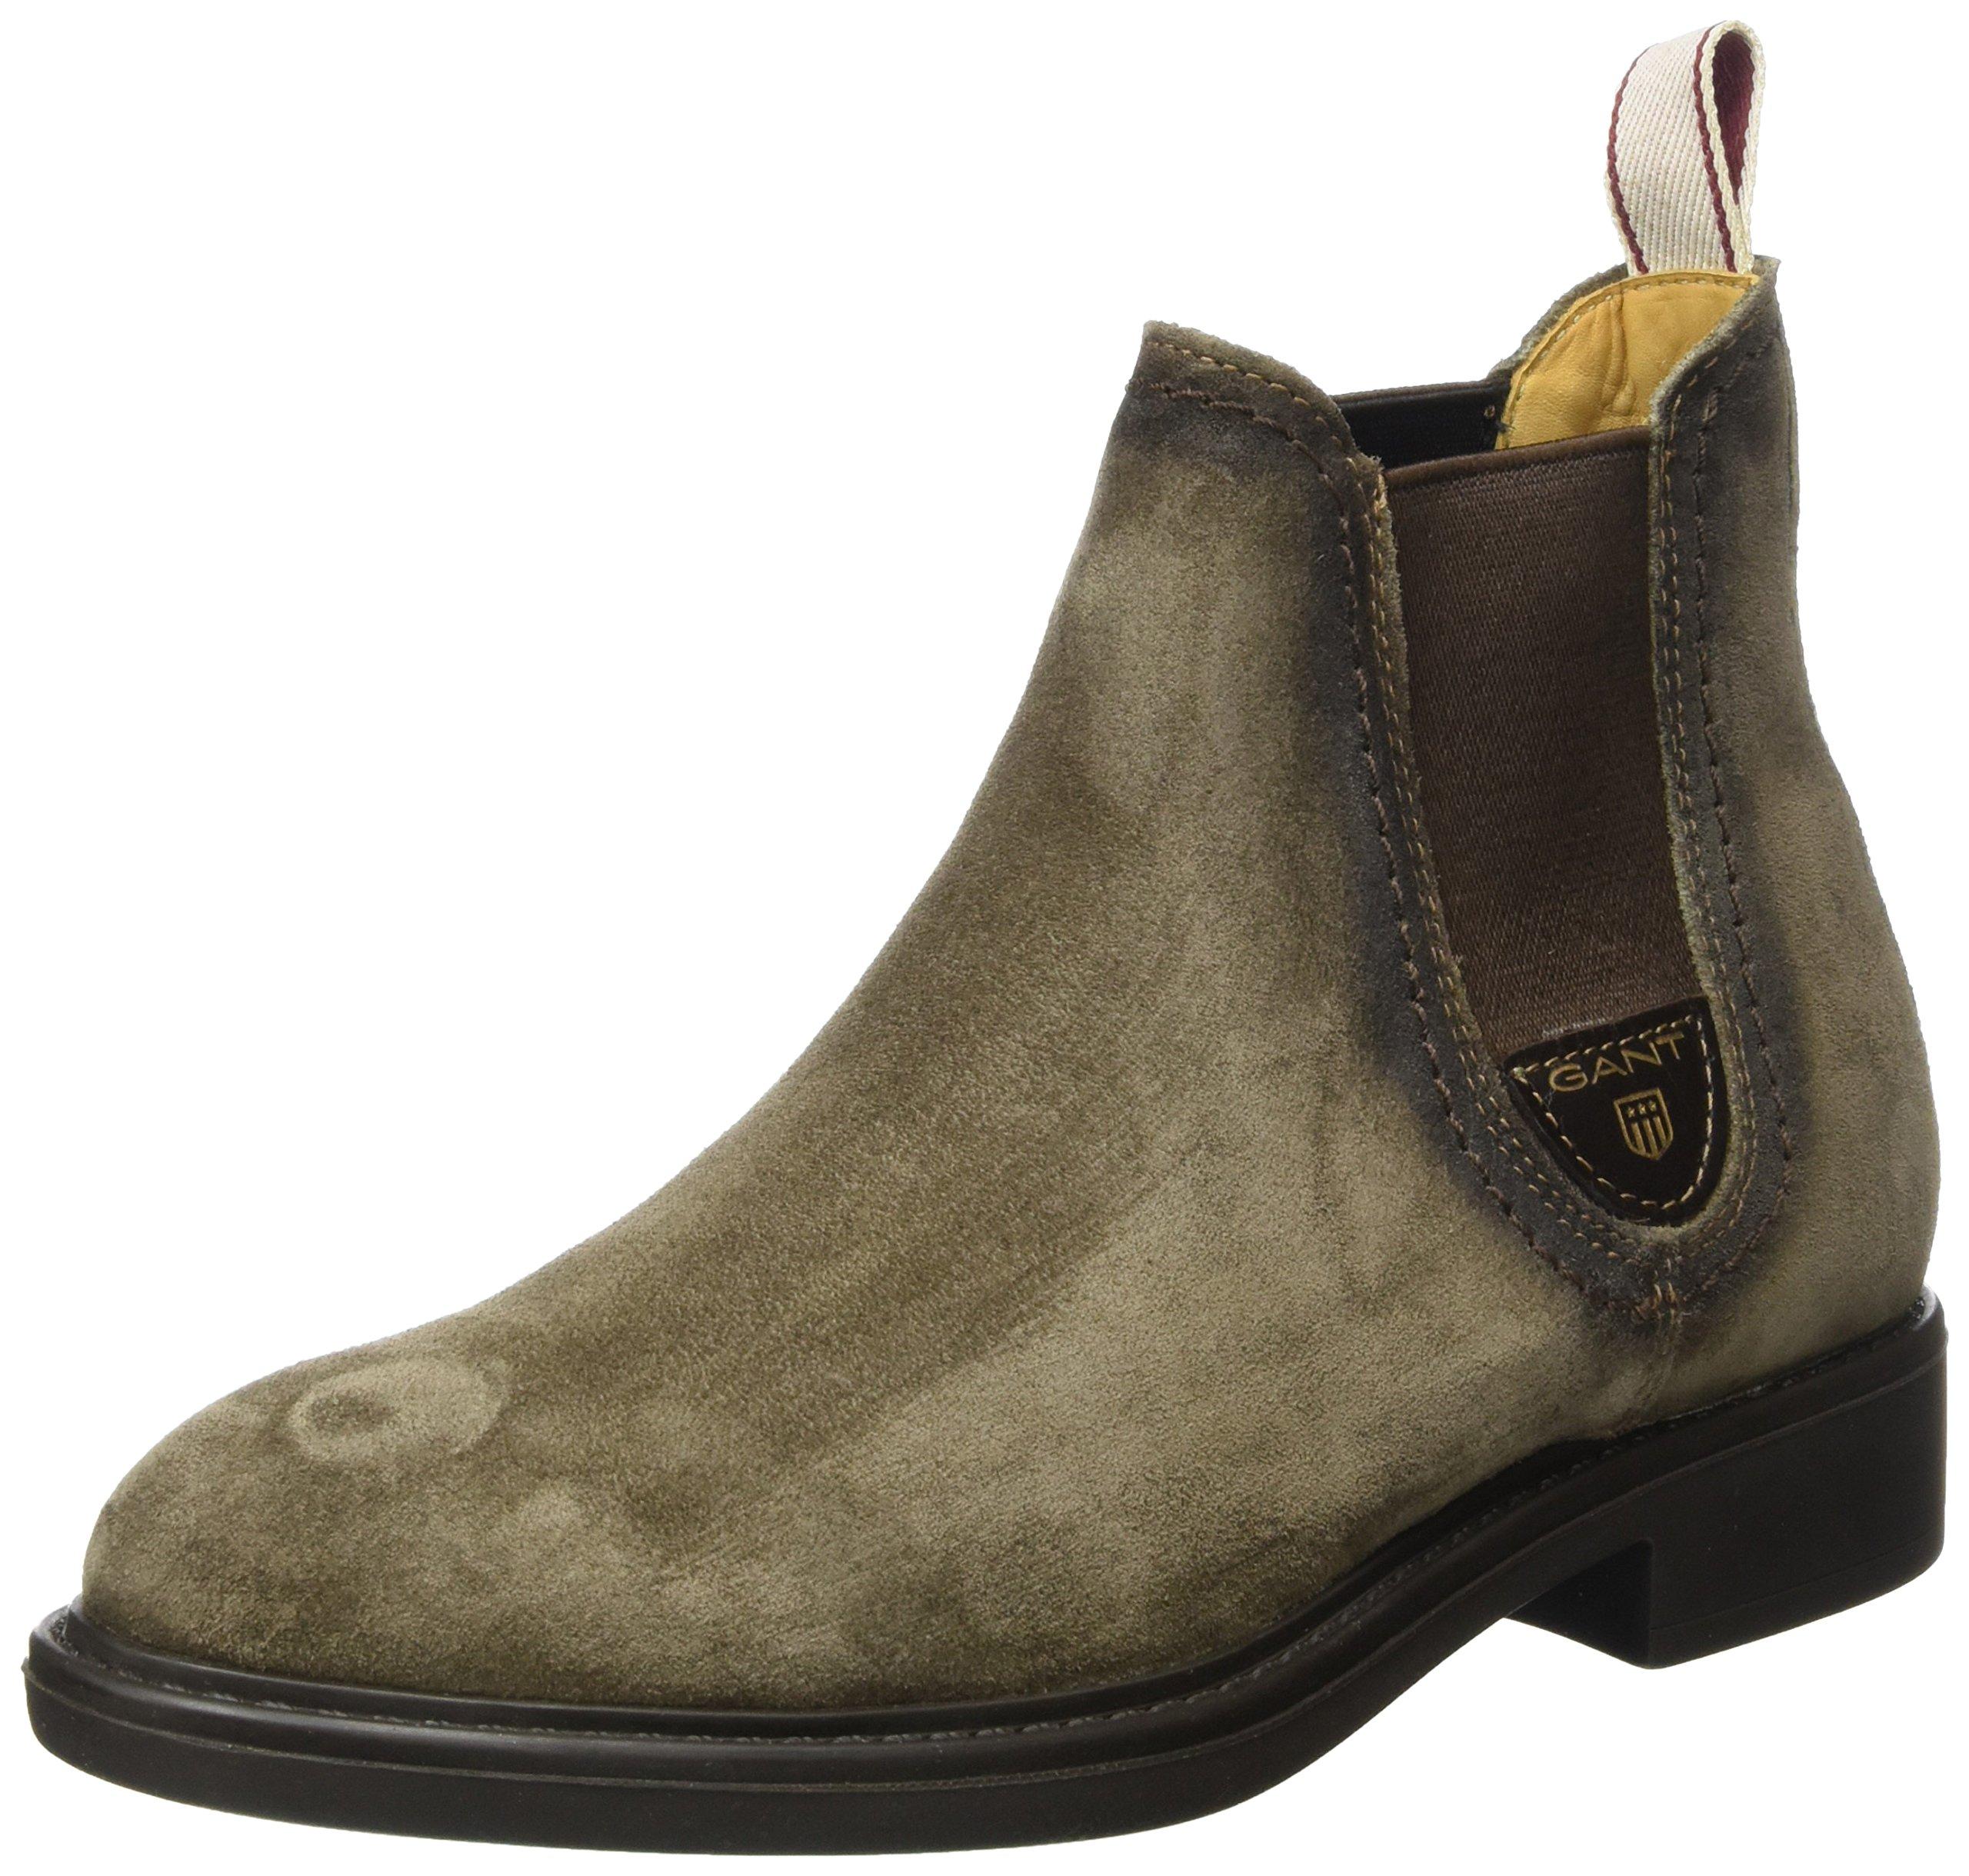 LydiaChelsea Gant FemmeBeigetaupe G2439 Eu Boots WDYH2E9I